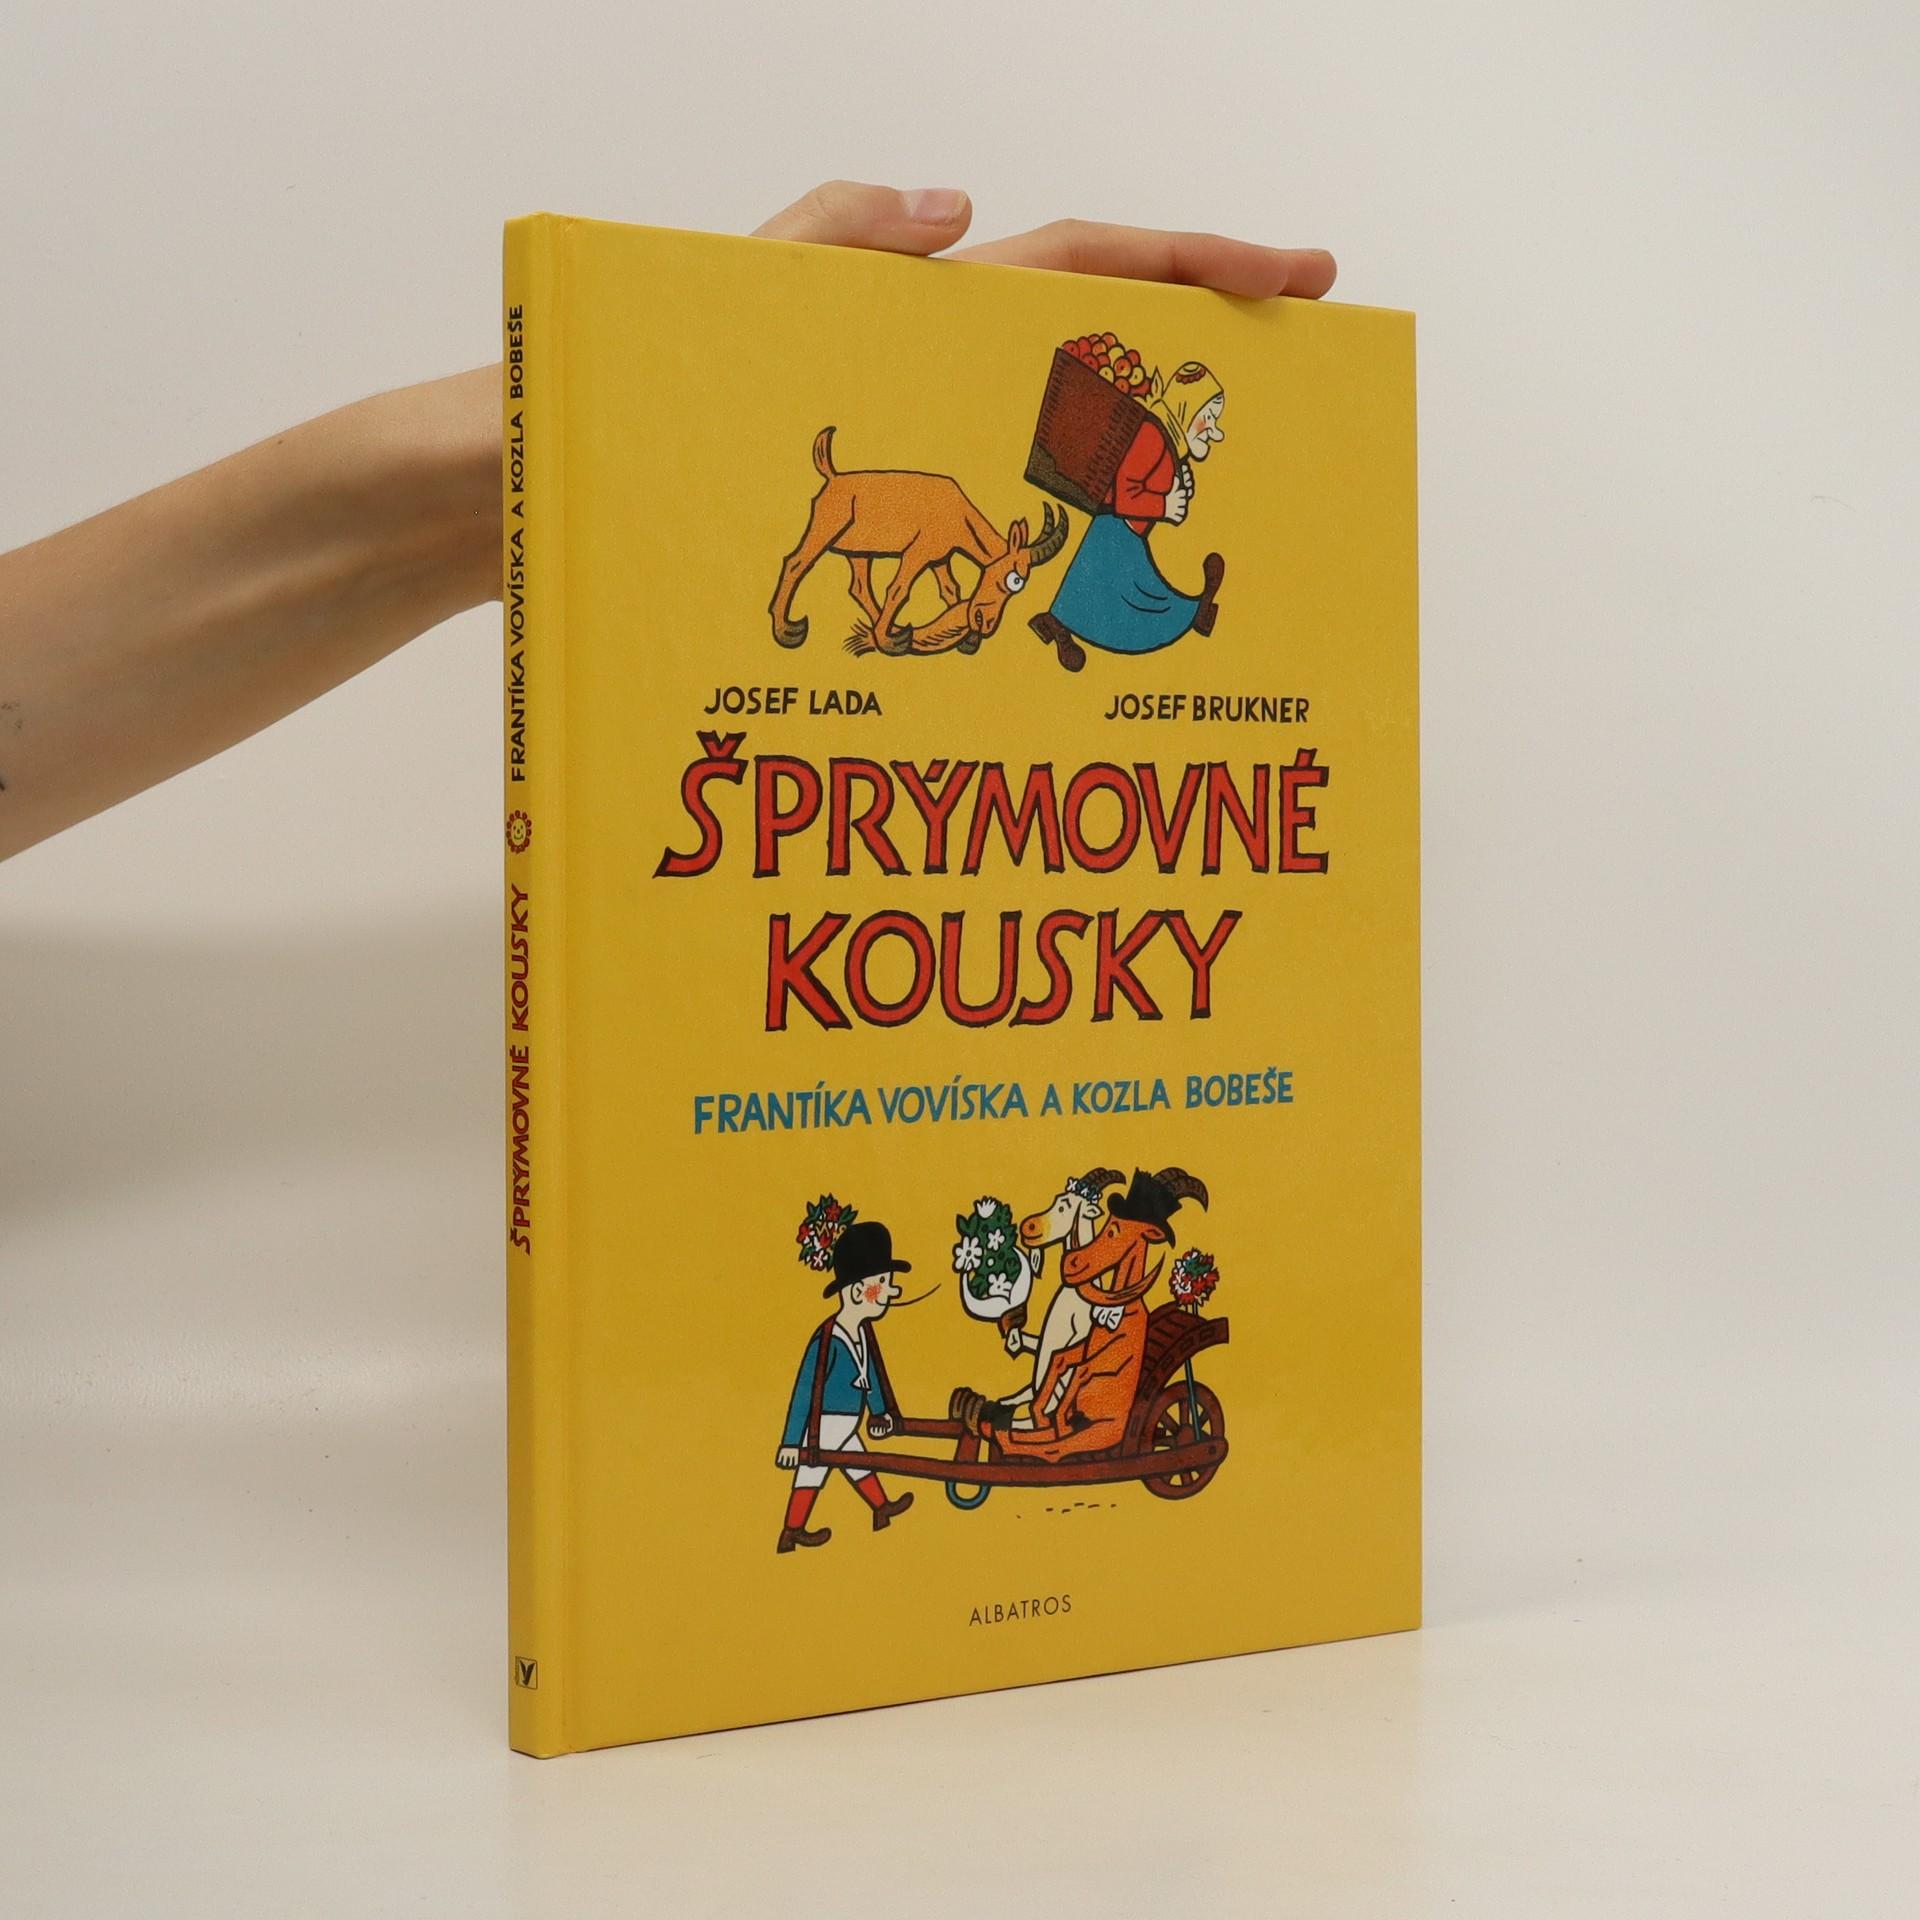 antikvární kniha Šprýmovné kousky Frantíka Vovíska a kozla Bobeše, 2004